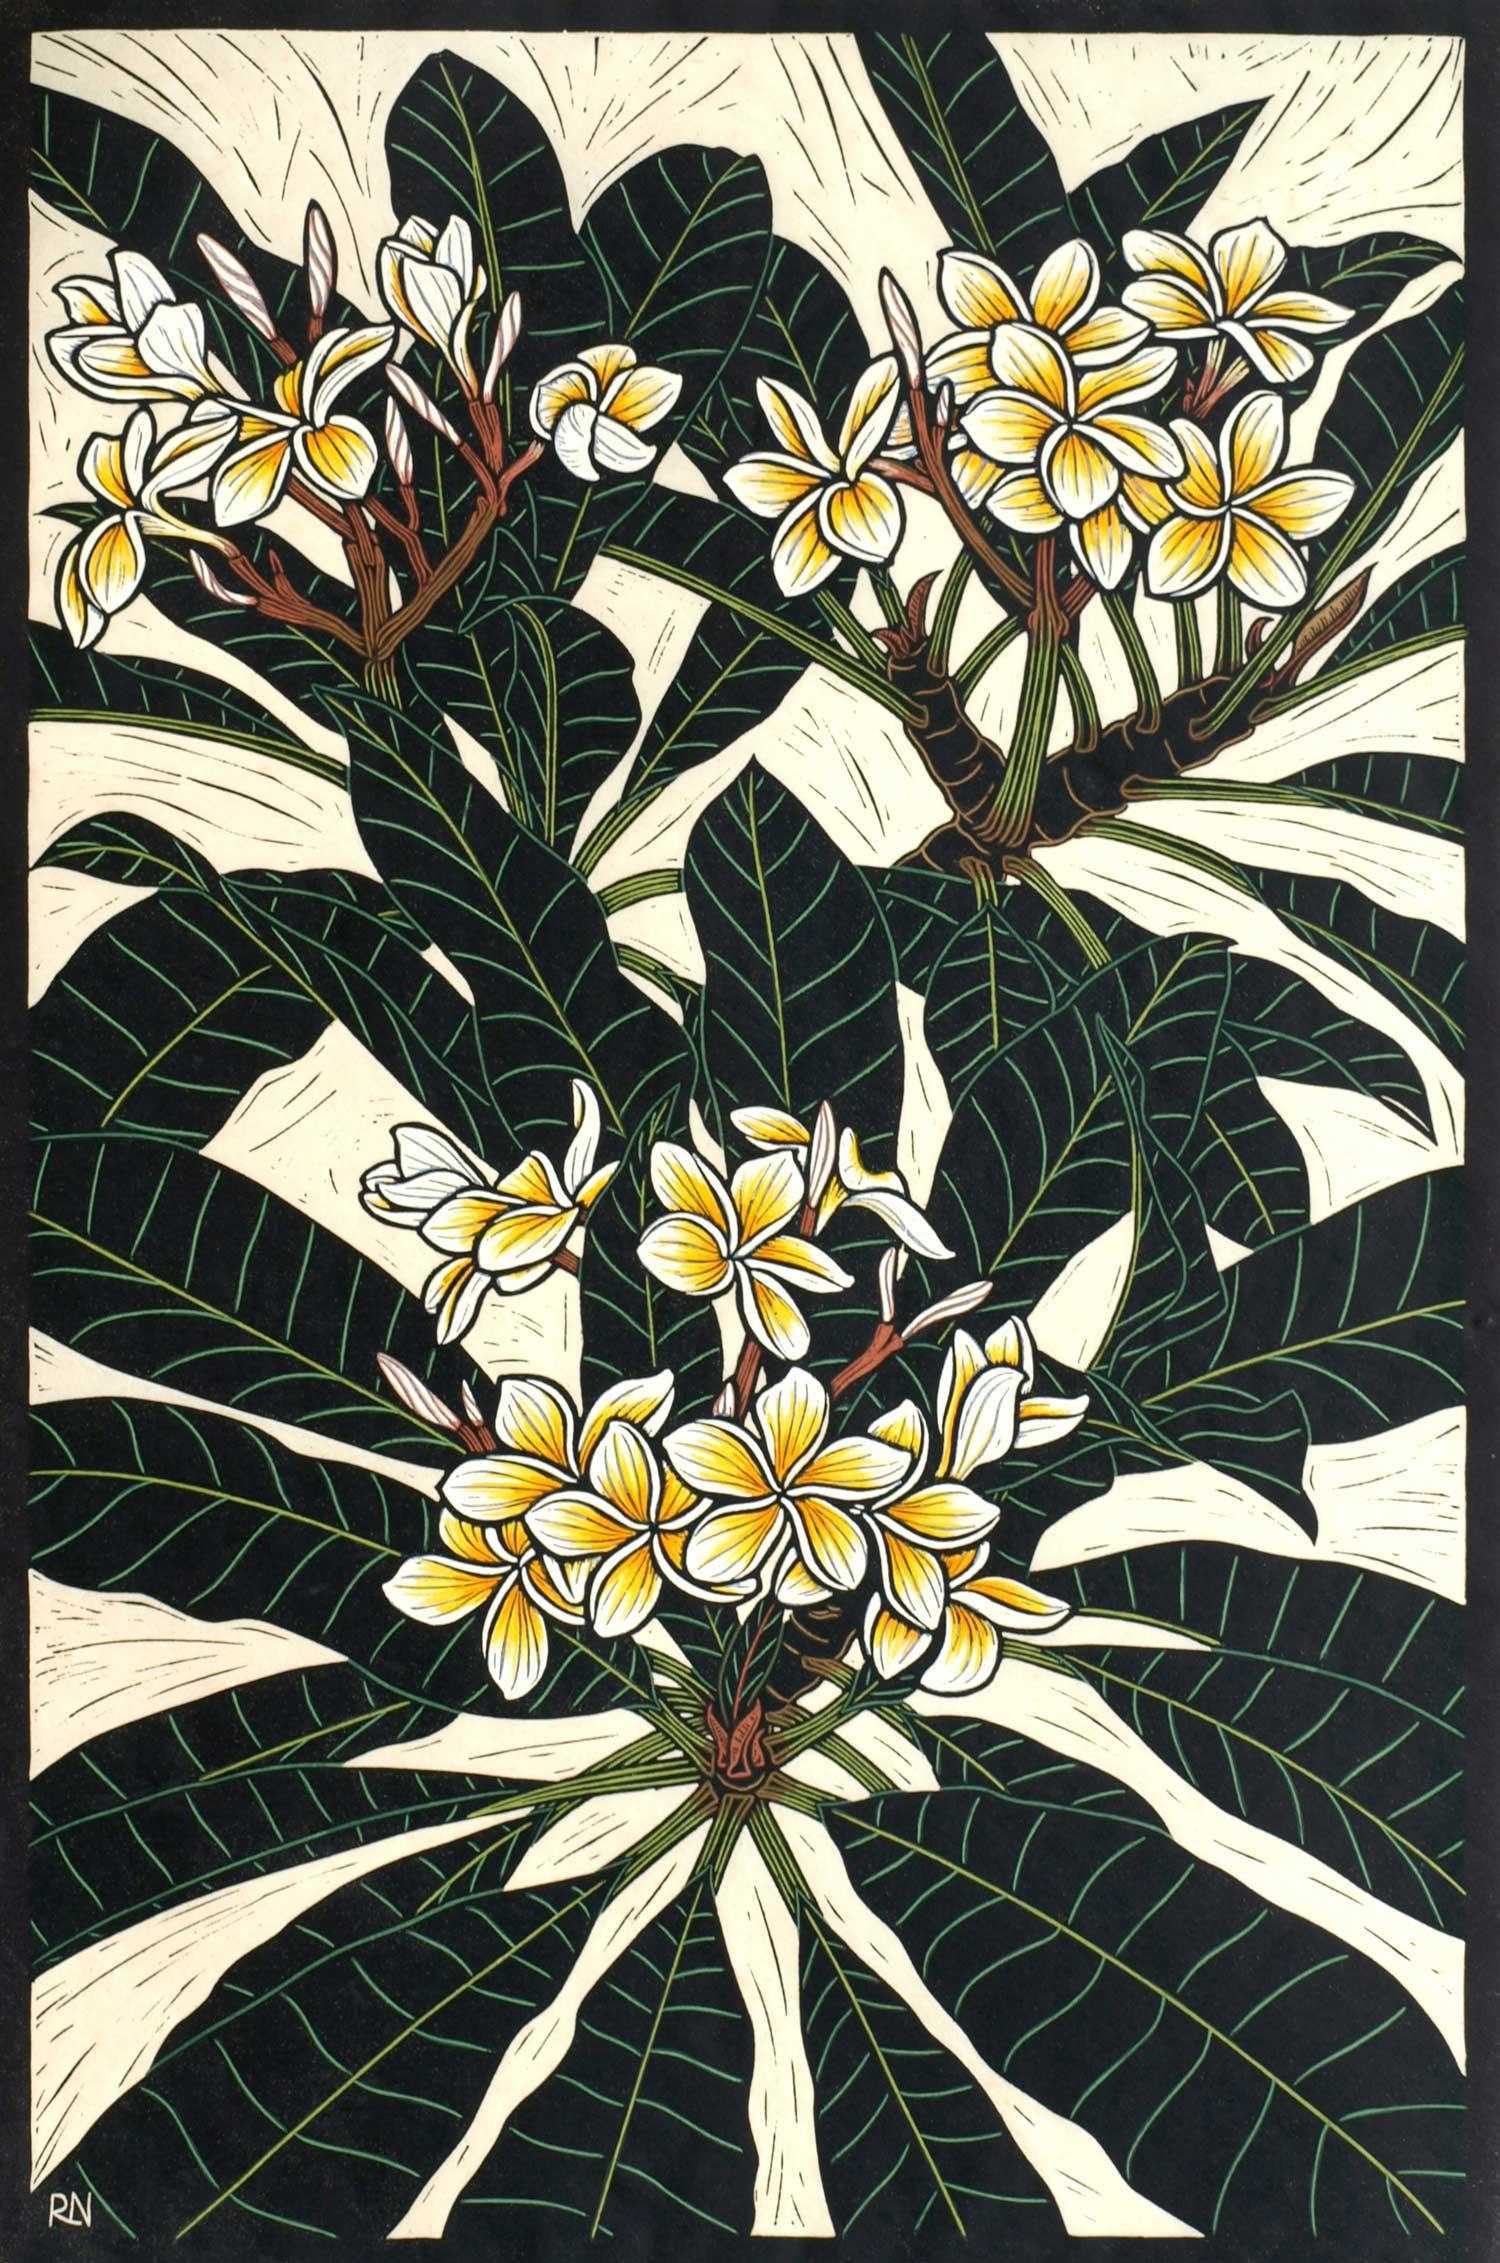 FRANGIPANI TREE  74.5 X 49.5 CM EDITION OF 50  HAND COLOURED LINOCUT ON HANDMADE JAPANESE PAPER  $1,550